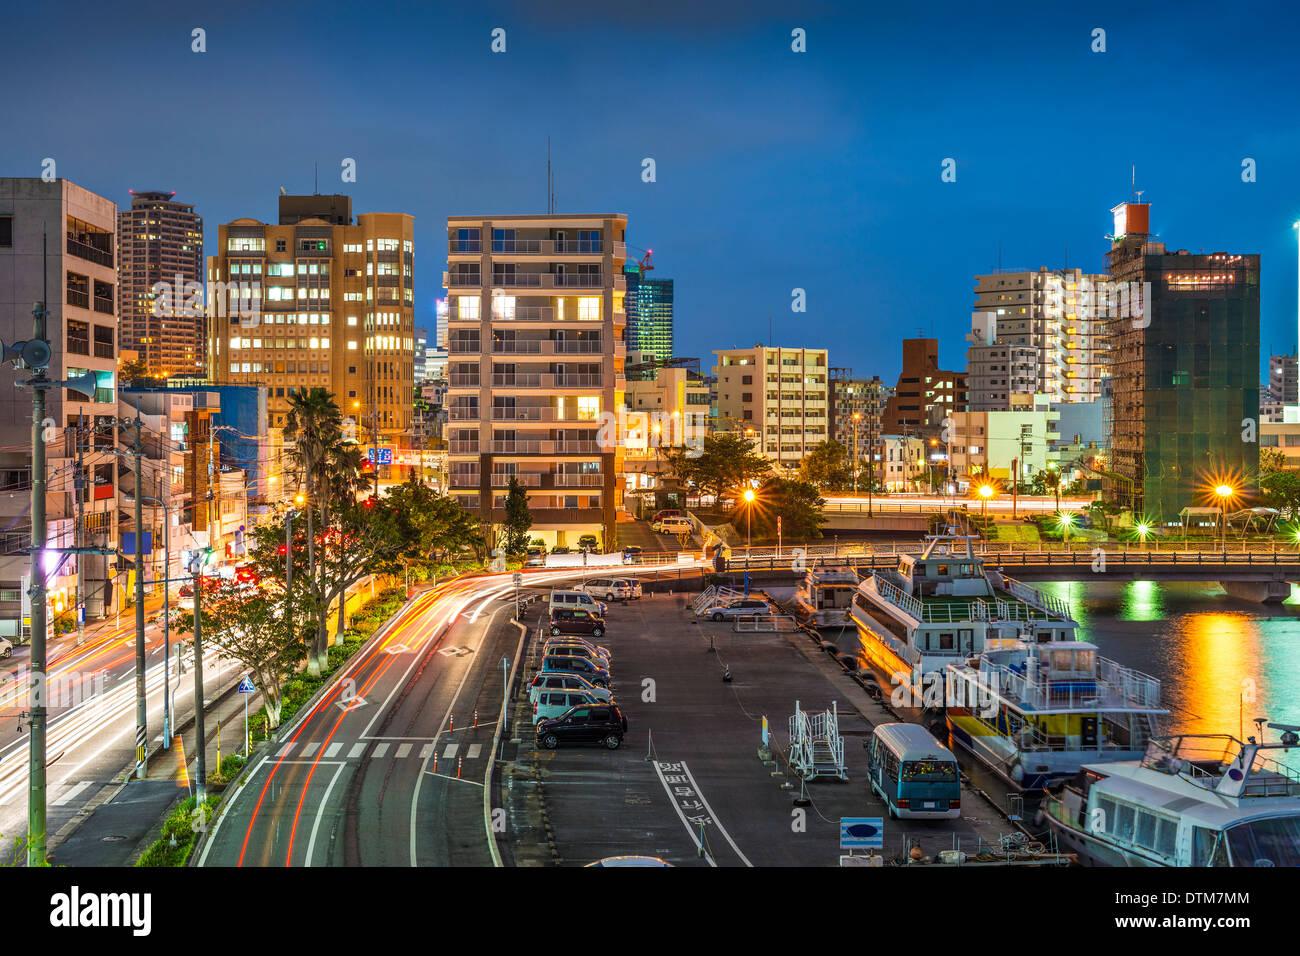 Naha, Okinawa, in Giappone skyline al Seaport. Immagini Stock